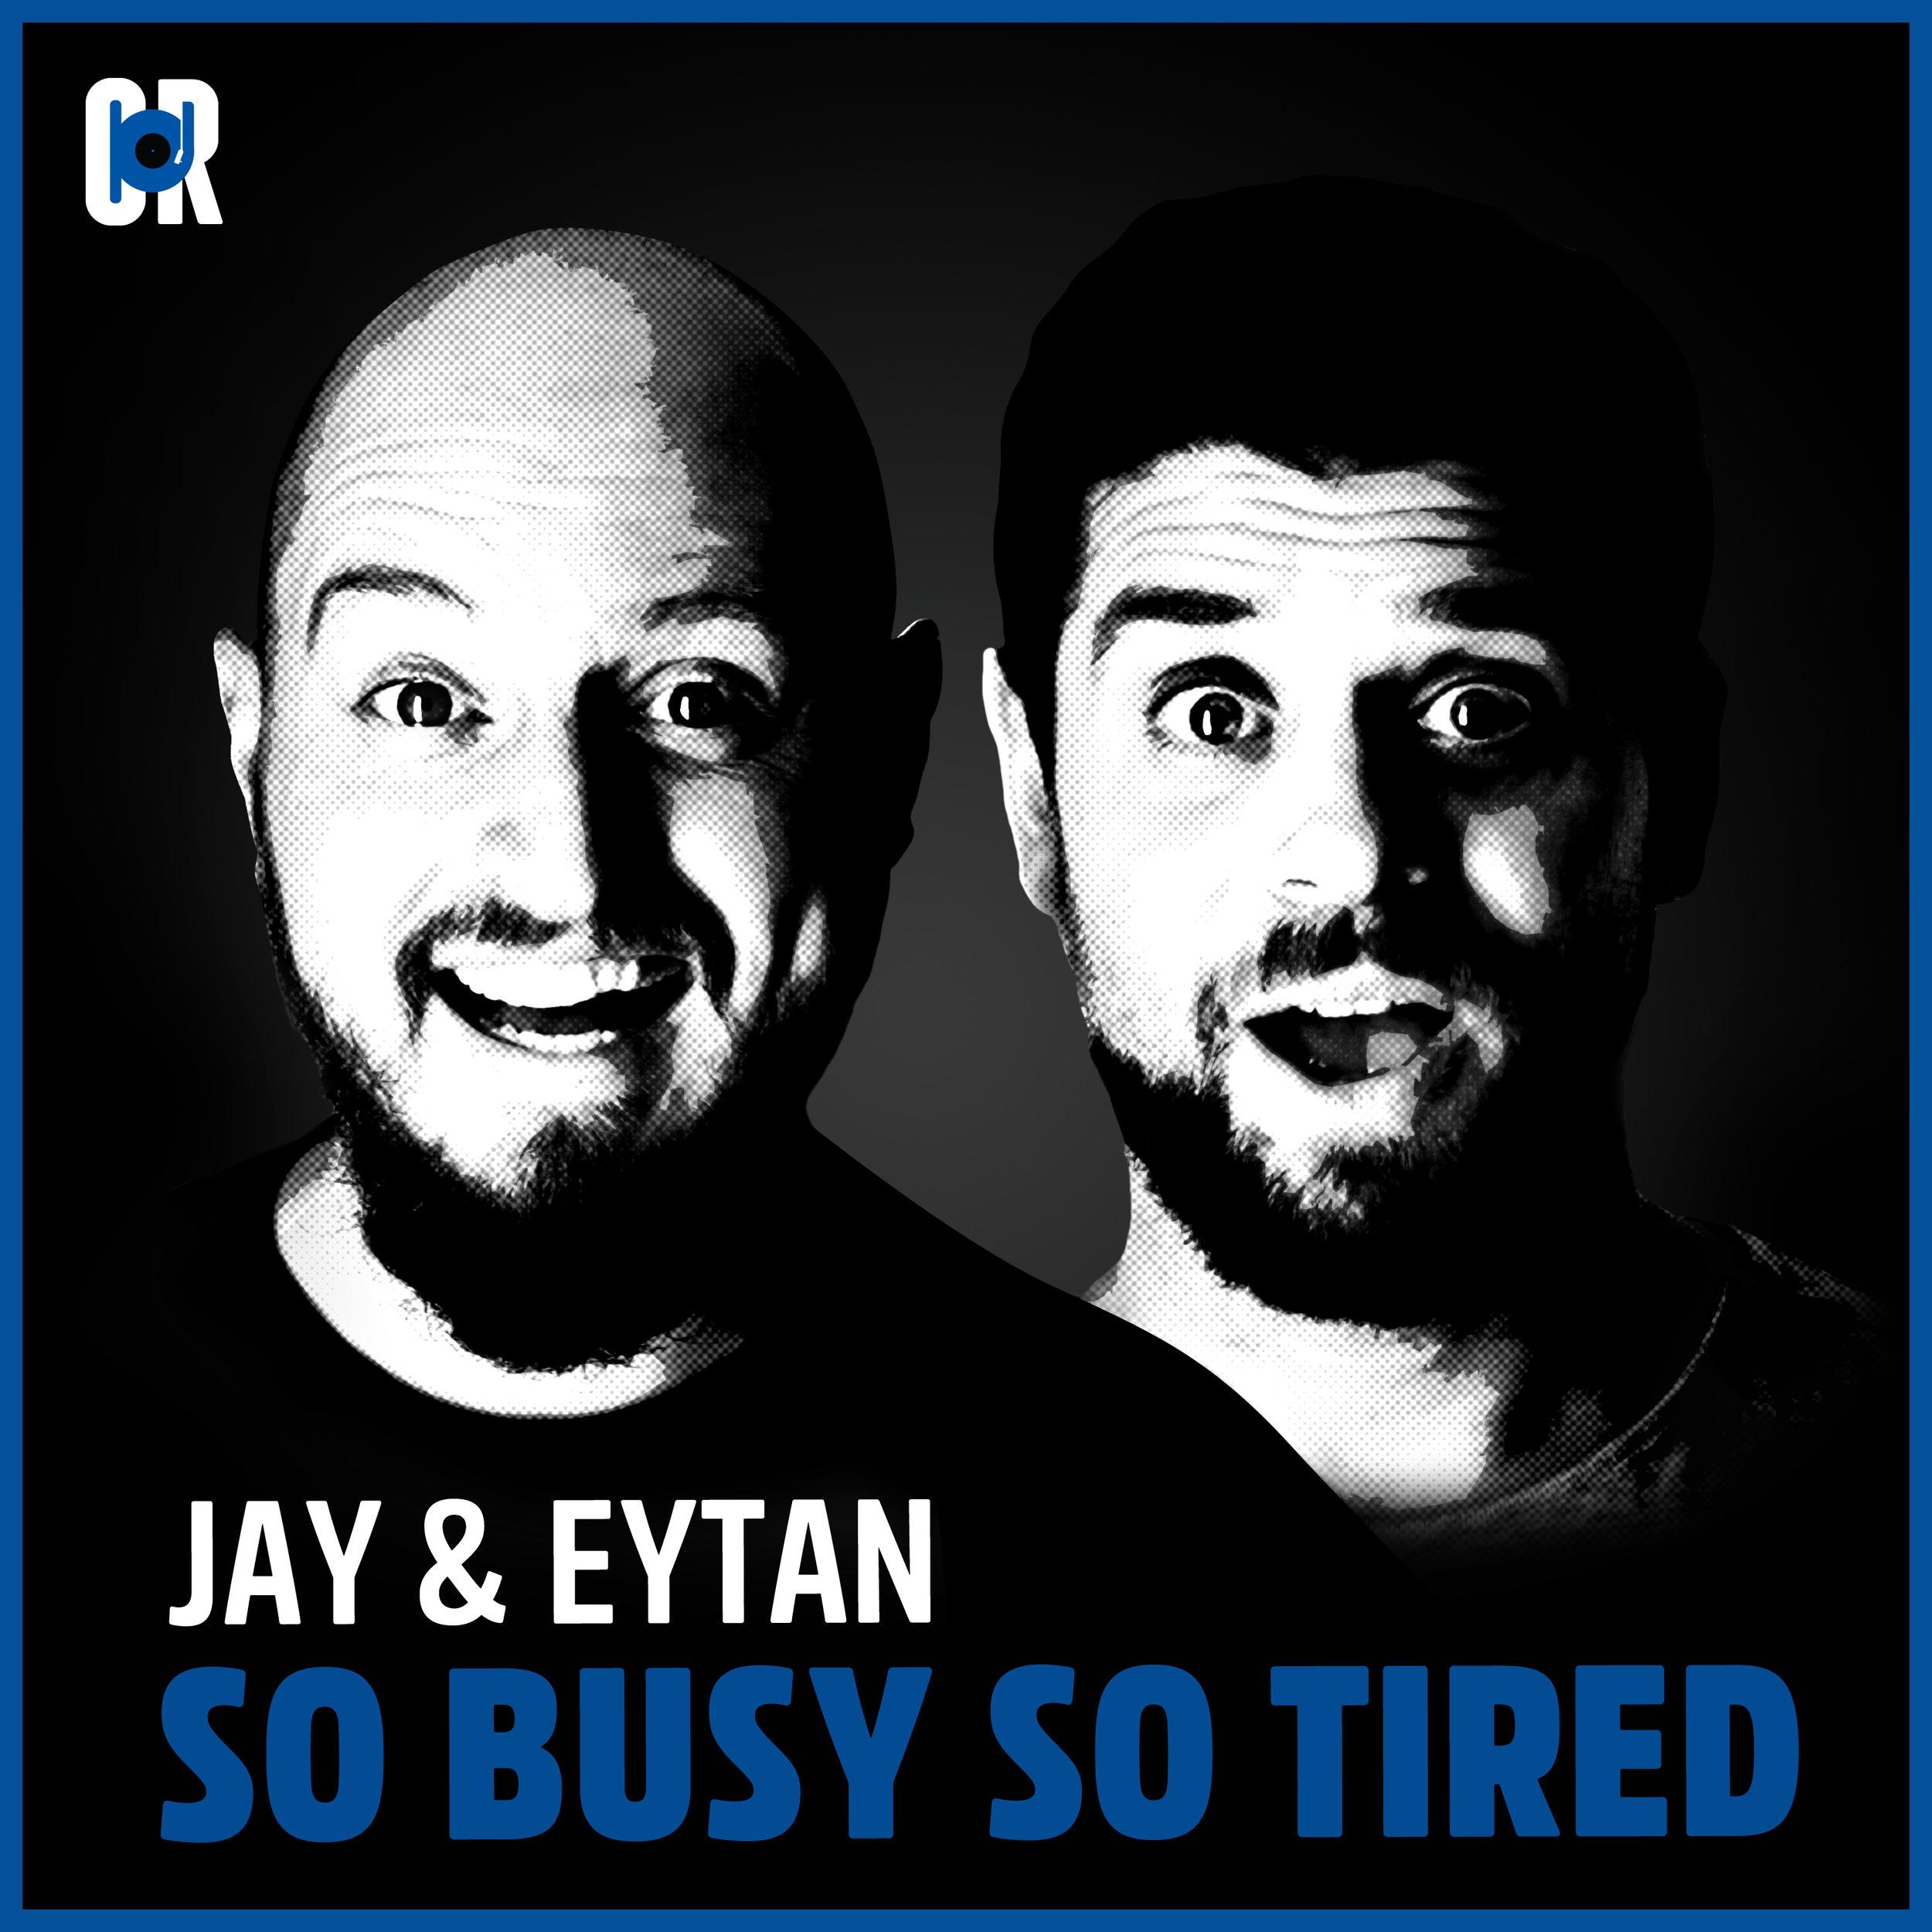 JayandEytan_SoBusySoTired_cover.jpg